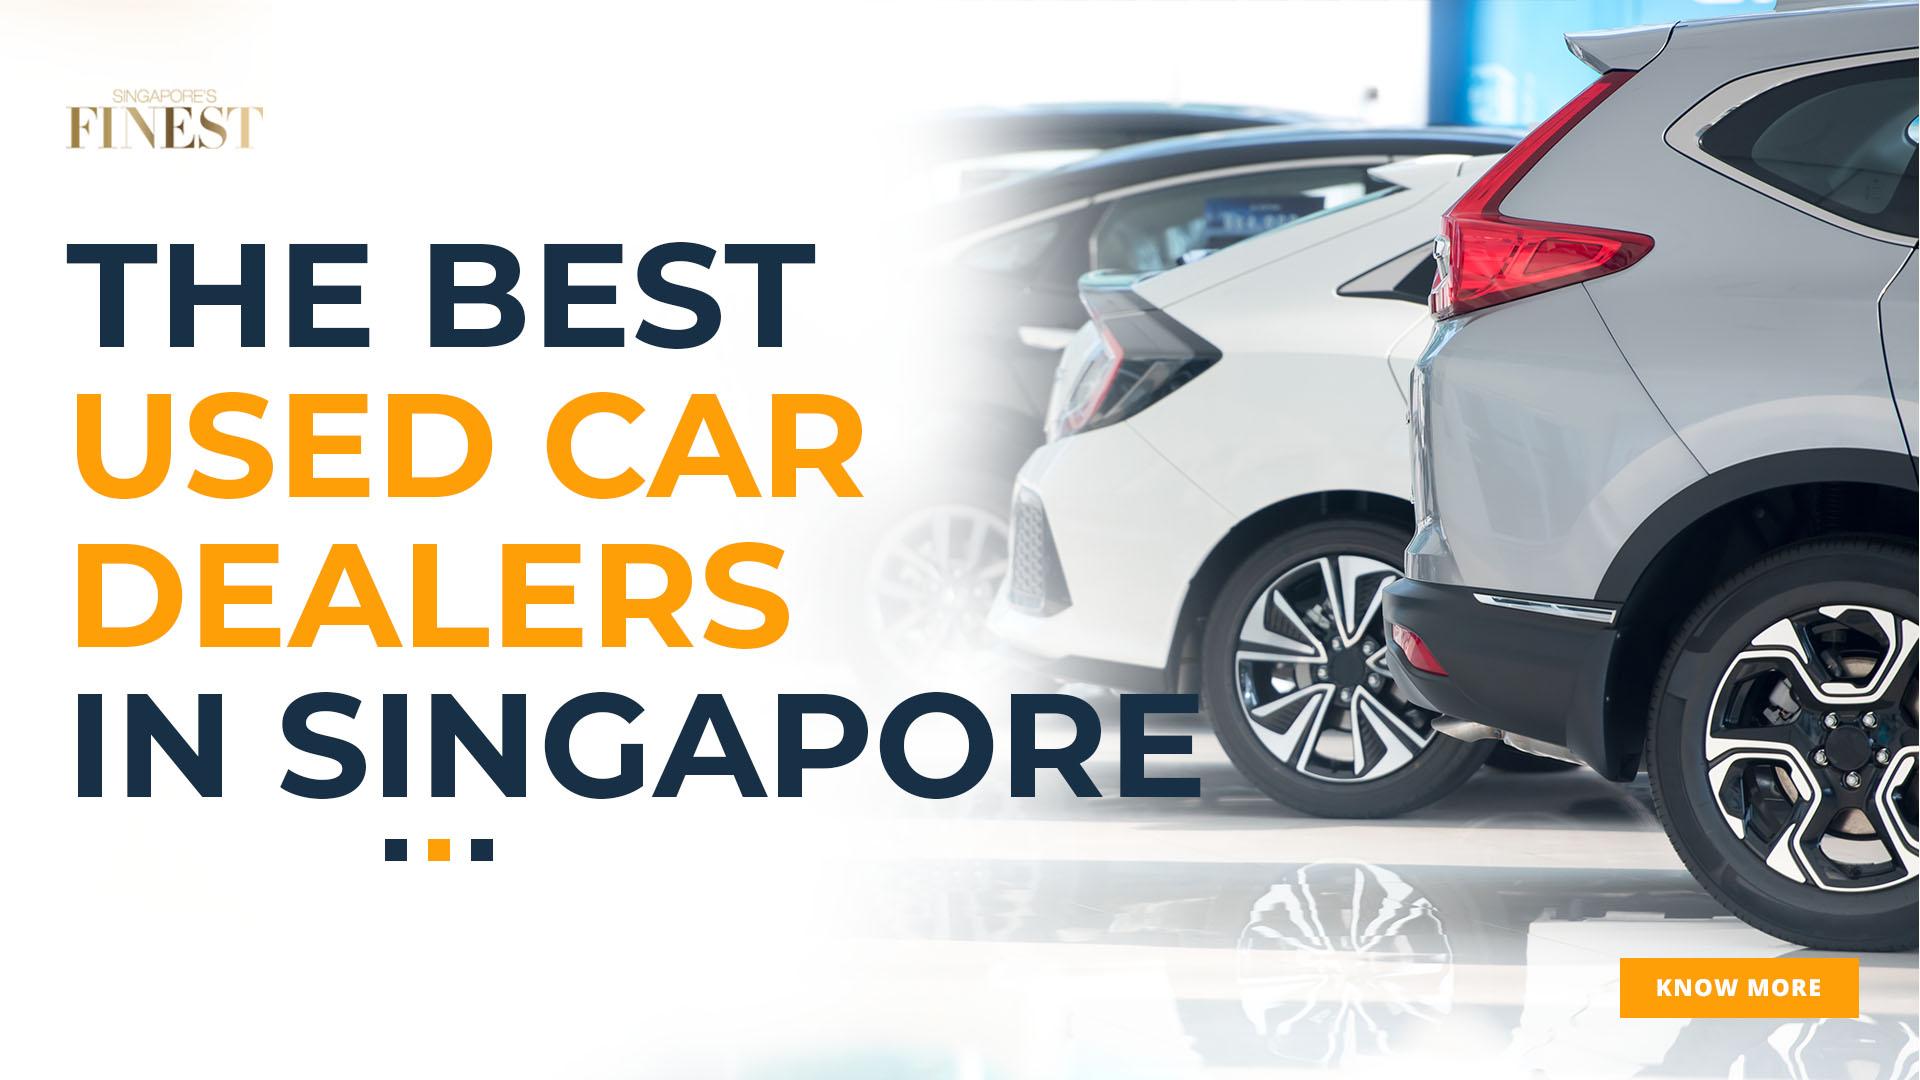 used car dealers advertising banner